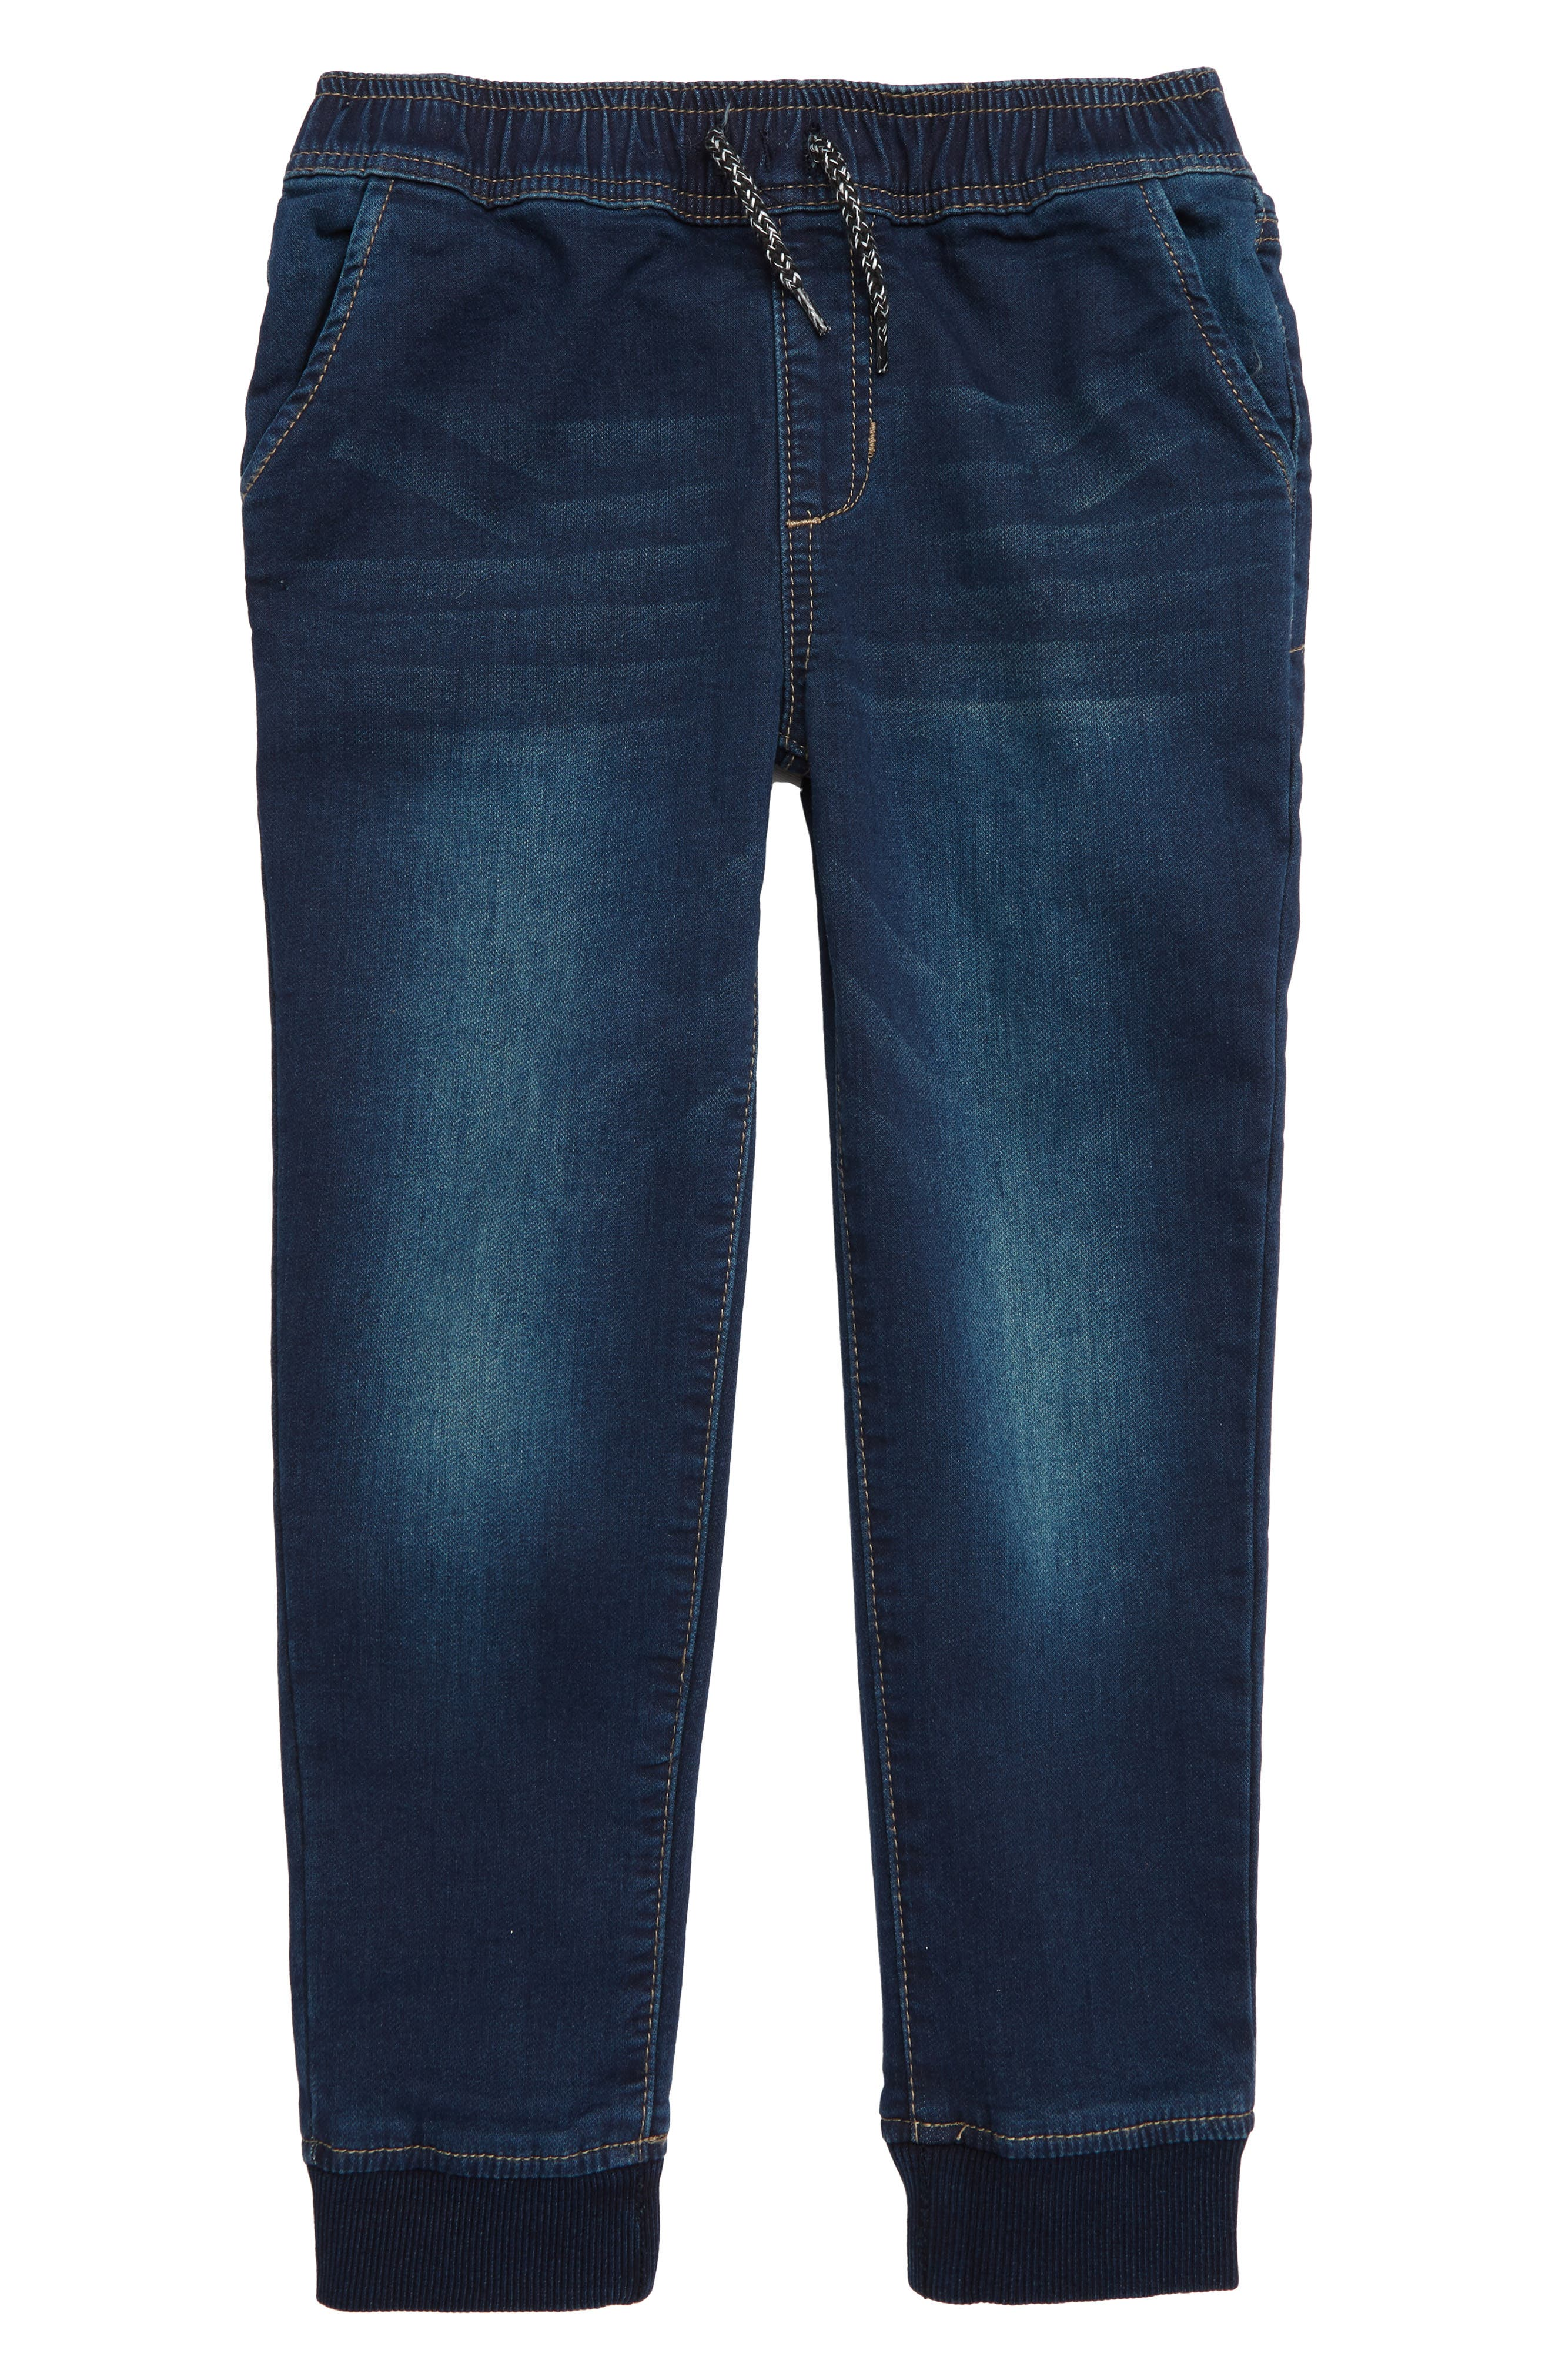 JOE'S The Jogger Slim Fit Knit Pants, Main, color, MARINE WASH